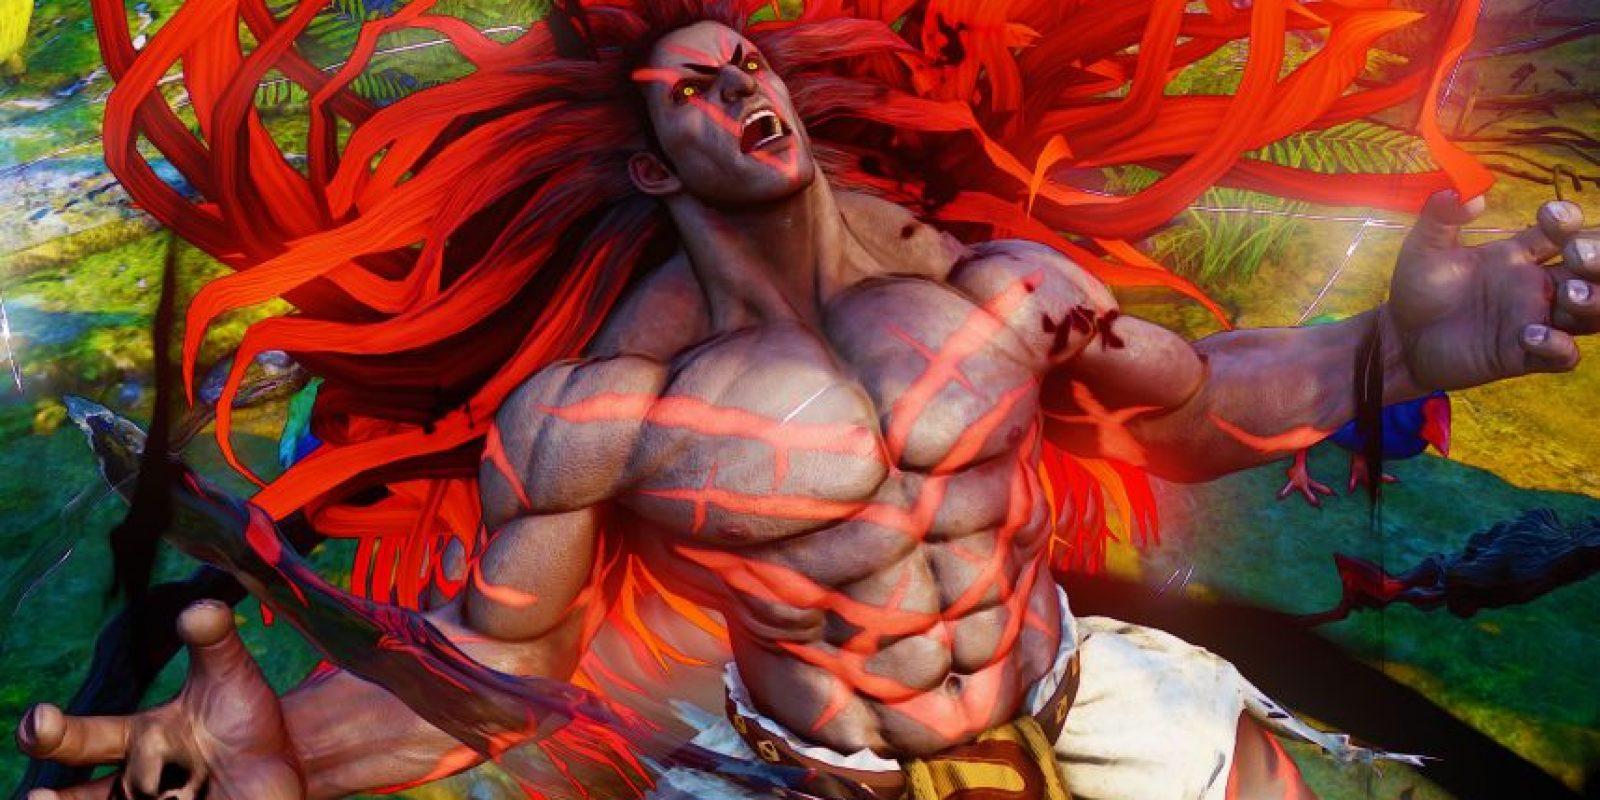 Street Fighter llegará a nuestras consolas en 2016. Foto:streetfighter.com